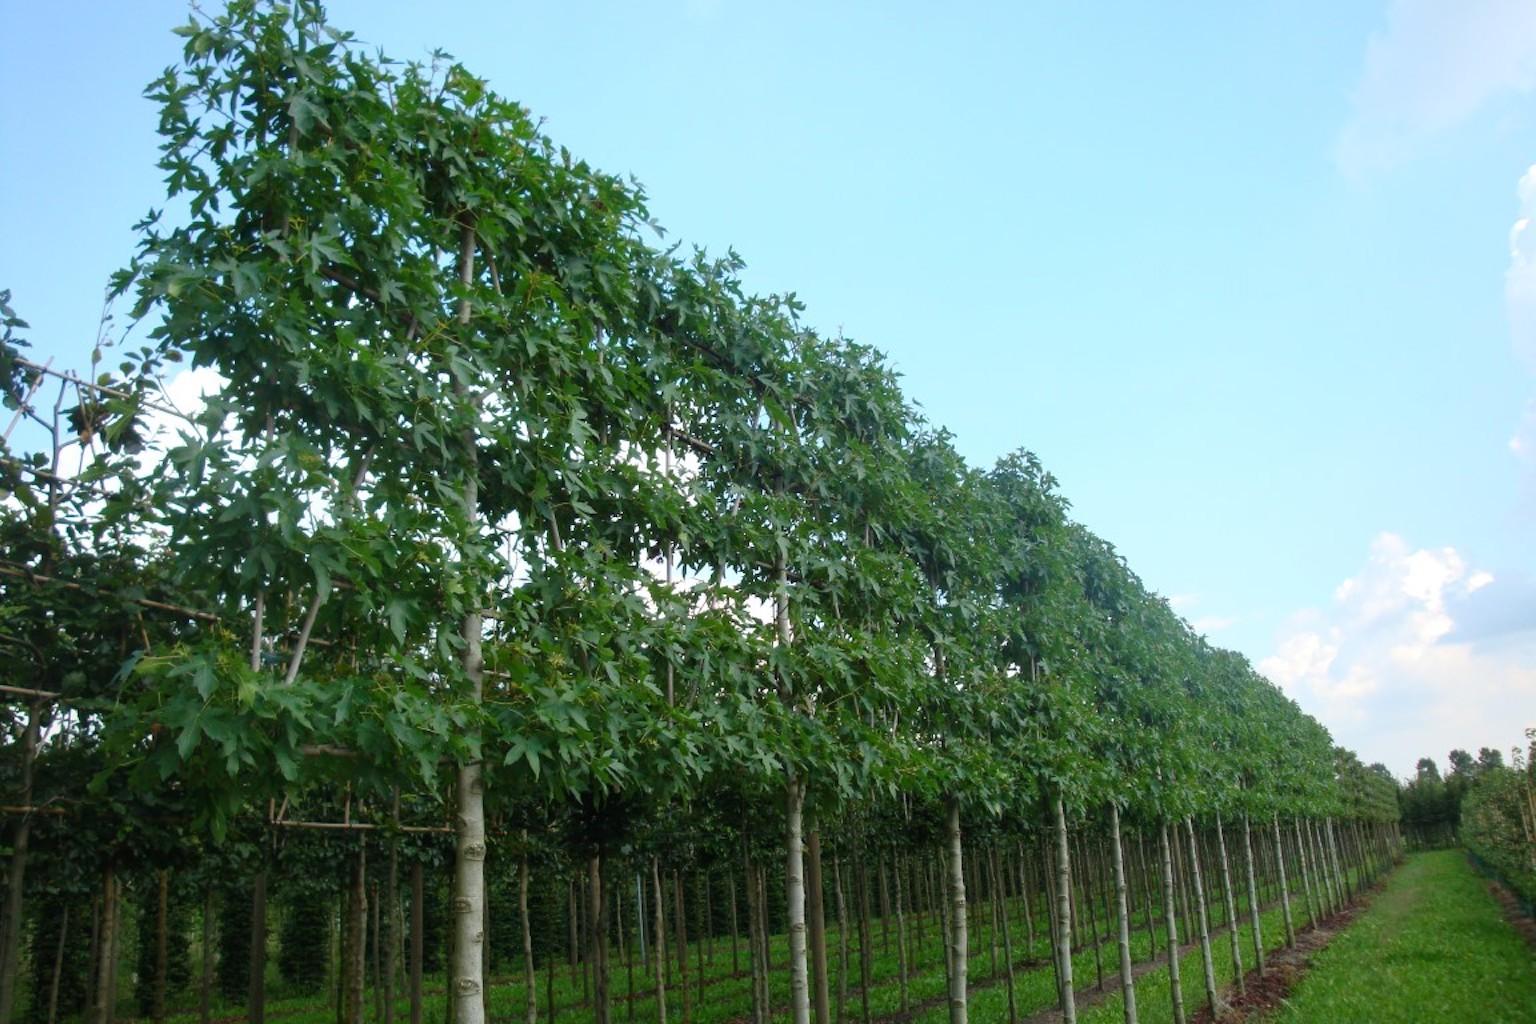 Liquidambar styraciflua 'Worplesdon' pleached 18-20, 210cm clear stem